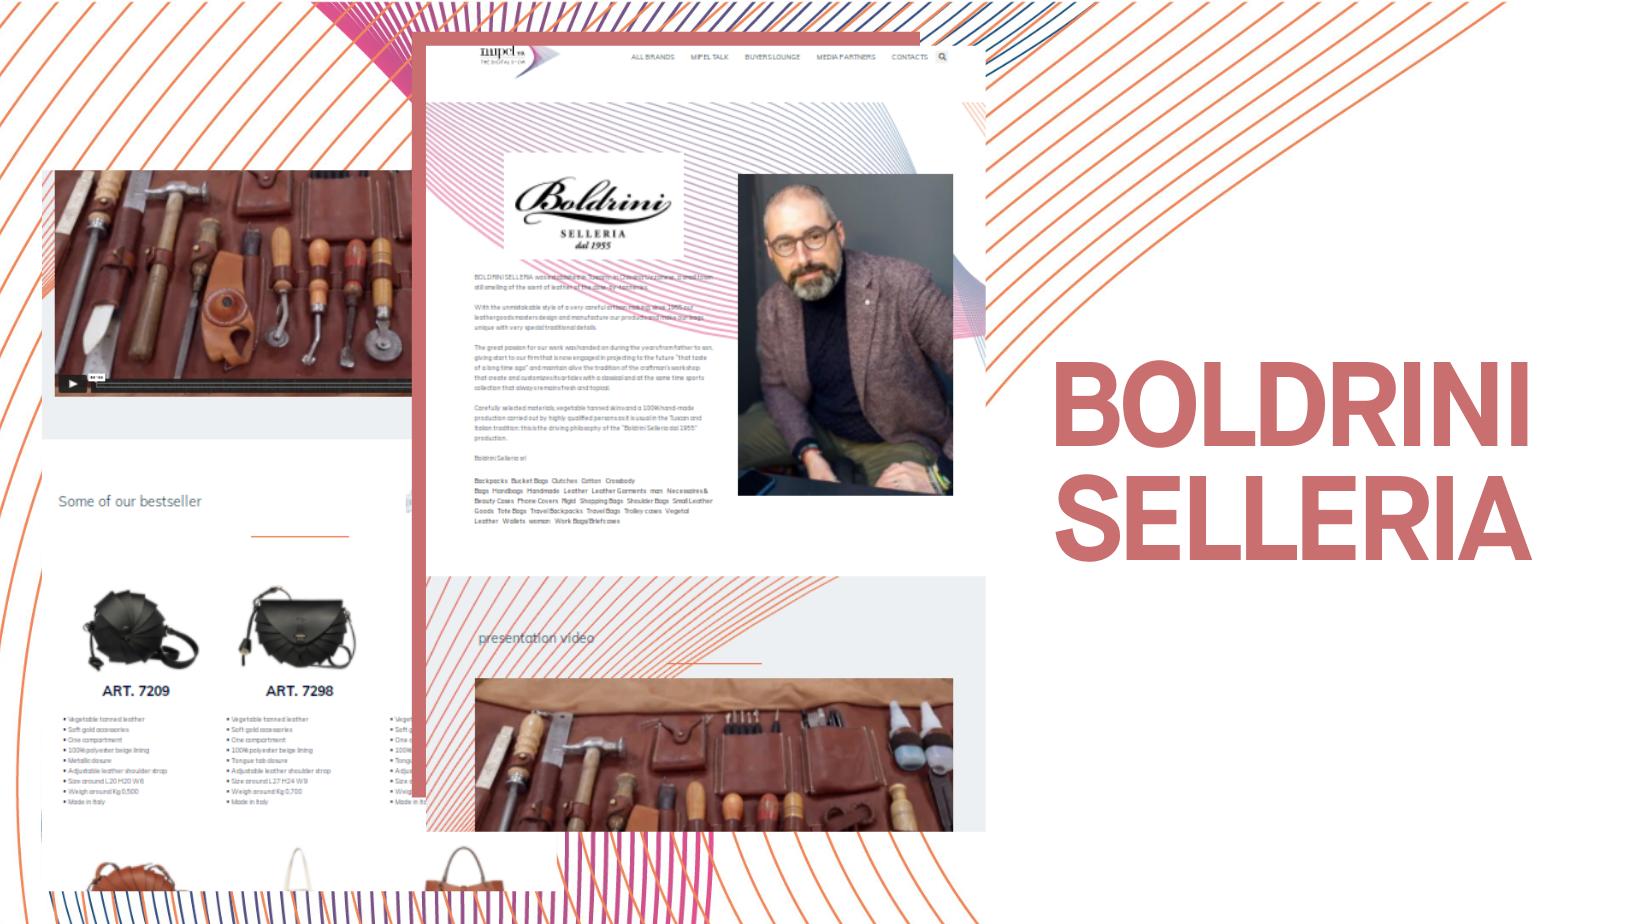 BOLDRINI SELLERIA - mipelthedigitalshow.com